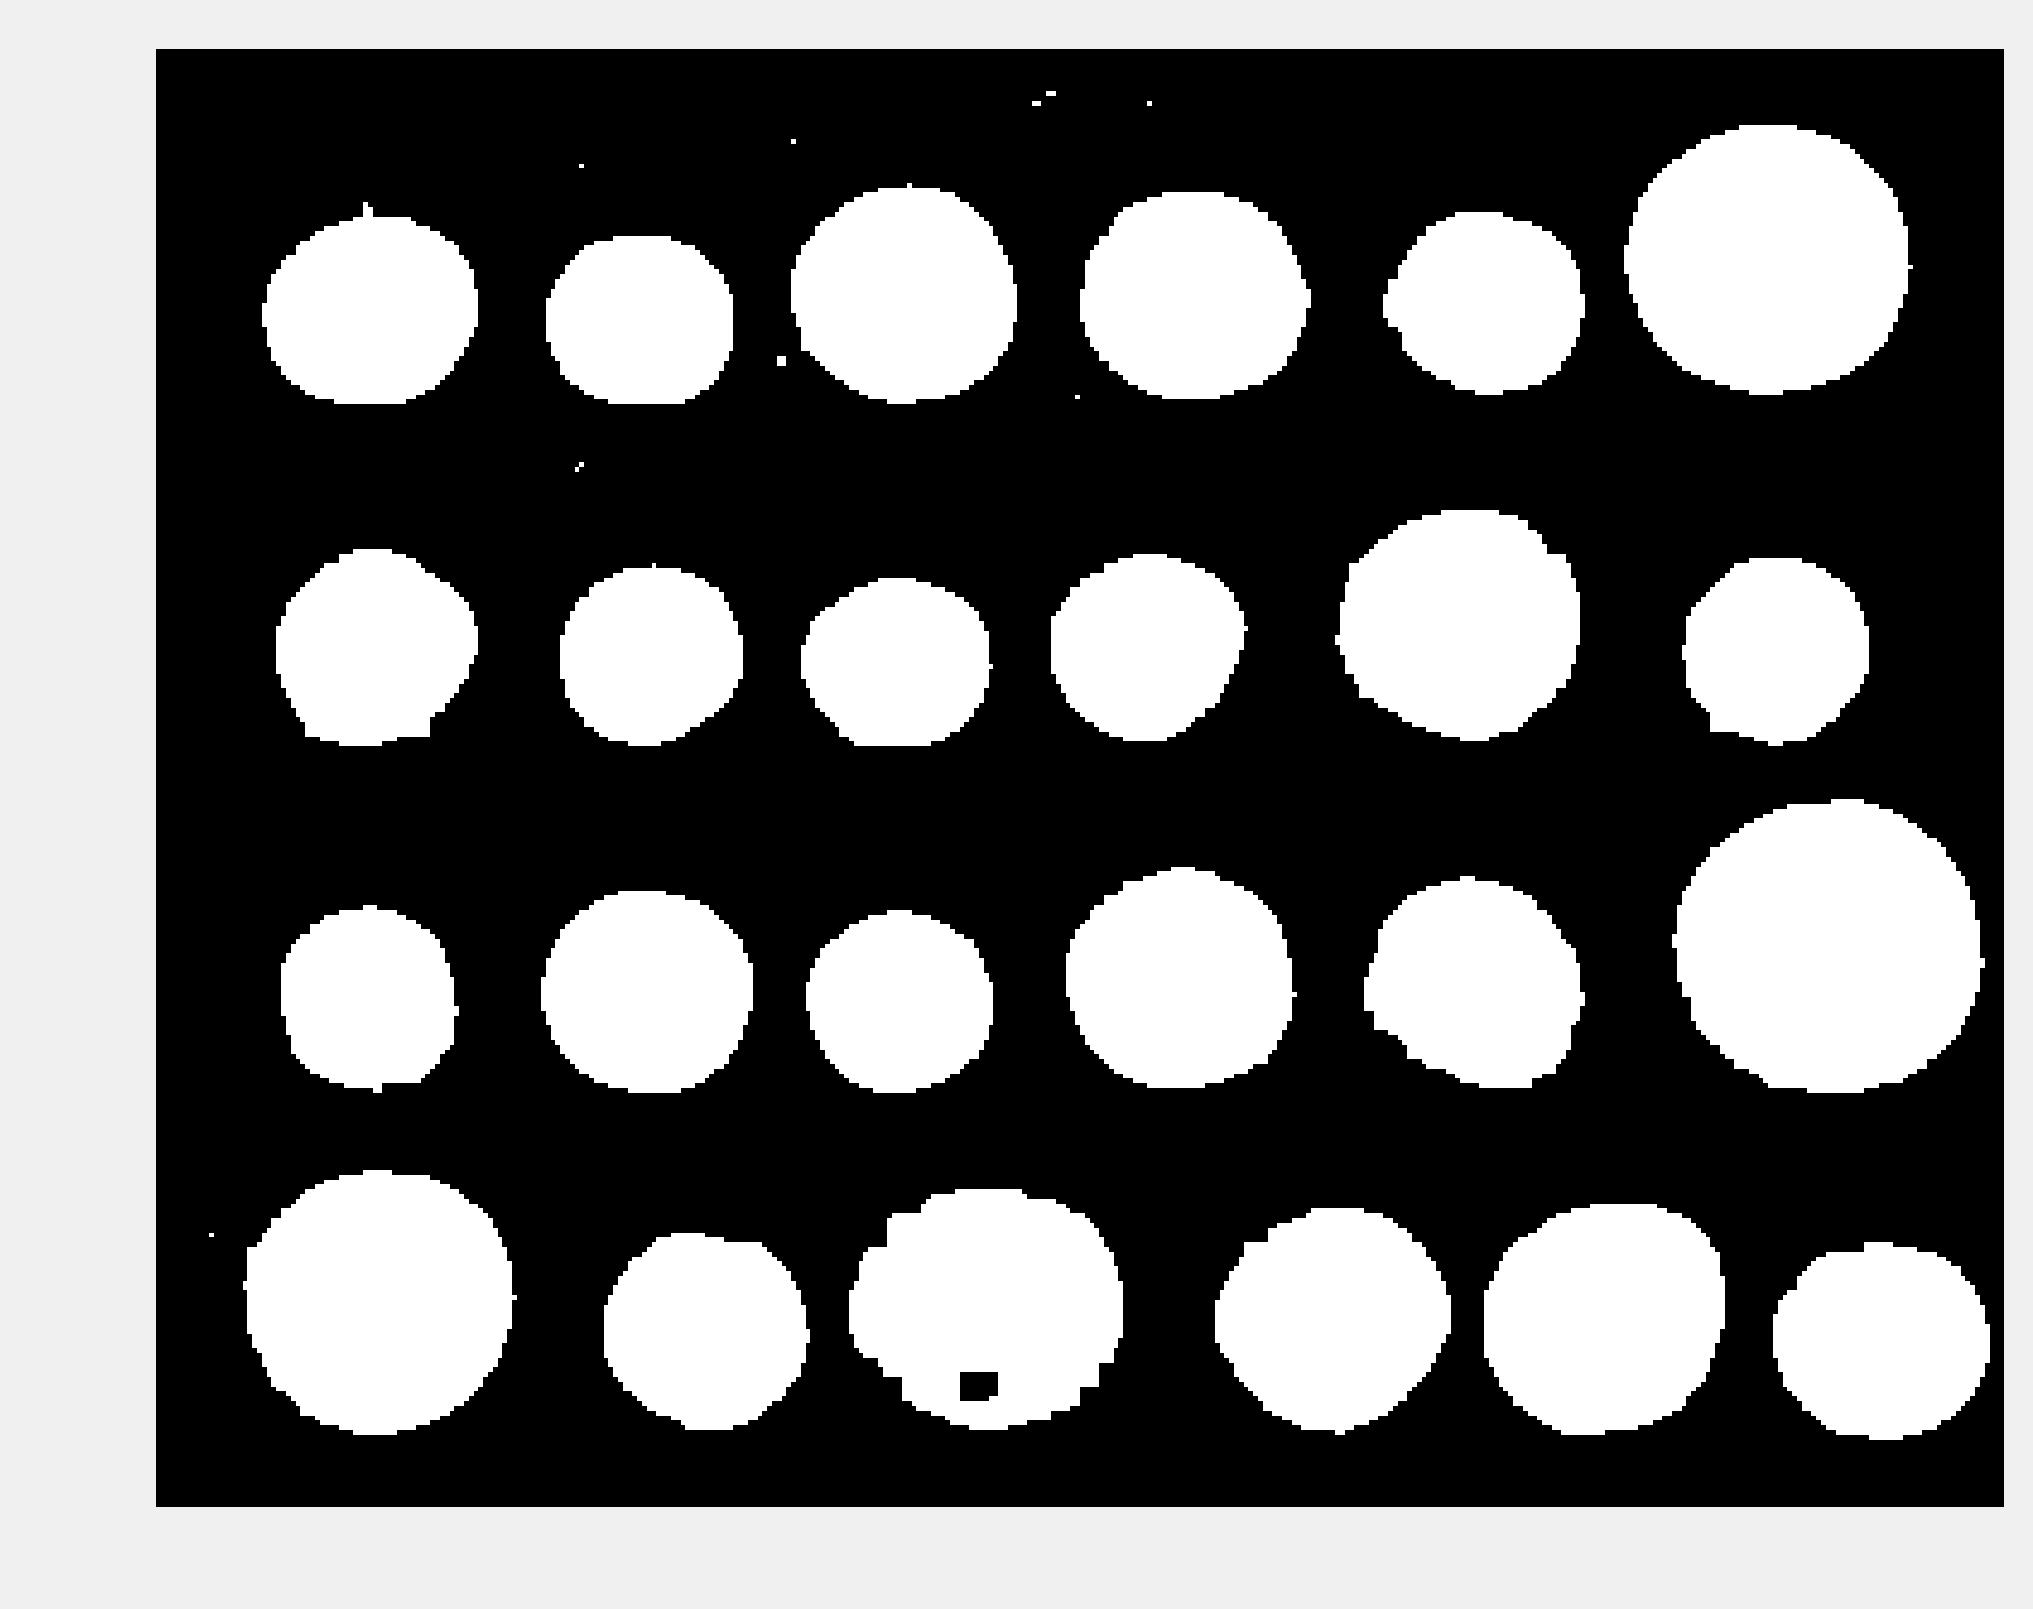 <matplotlib.figure.Figure at 0x79a5550>